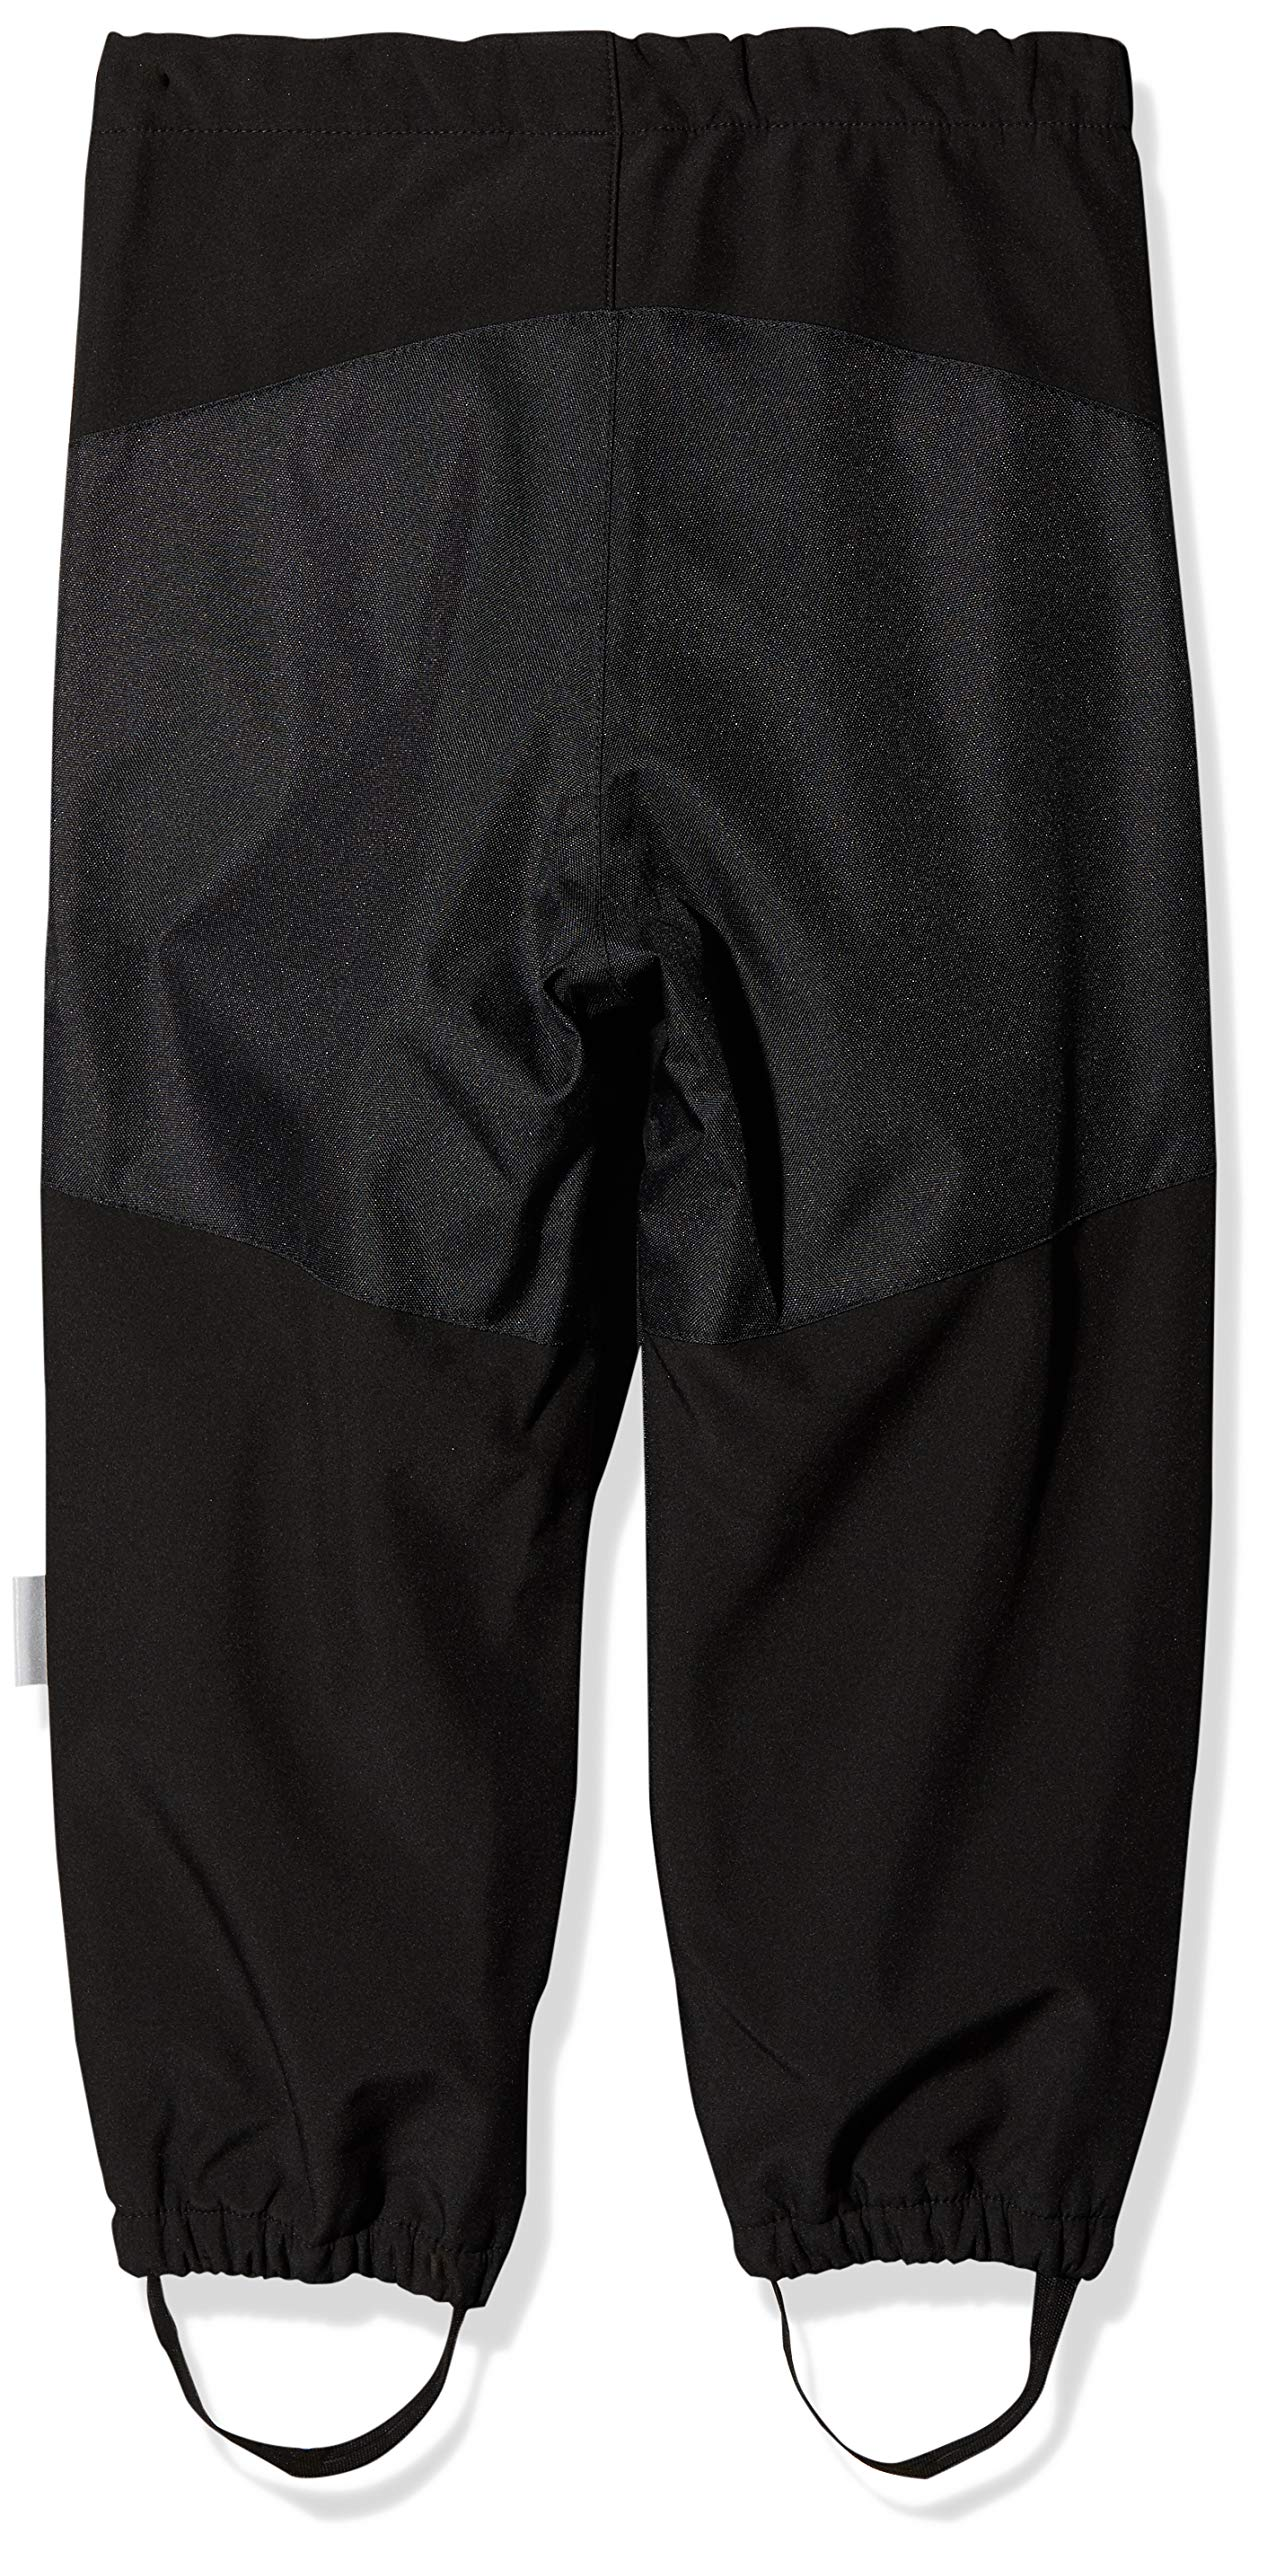 NAME IT Nitalfa Softshell Pant MZ Fo Noos Pantalones Impermeable para Bebés 2